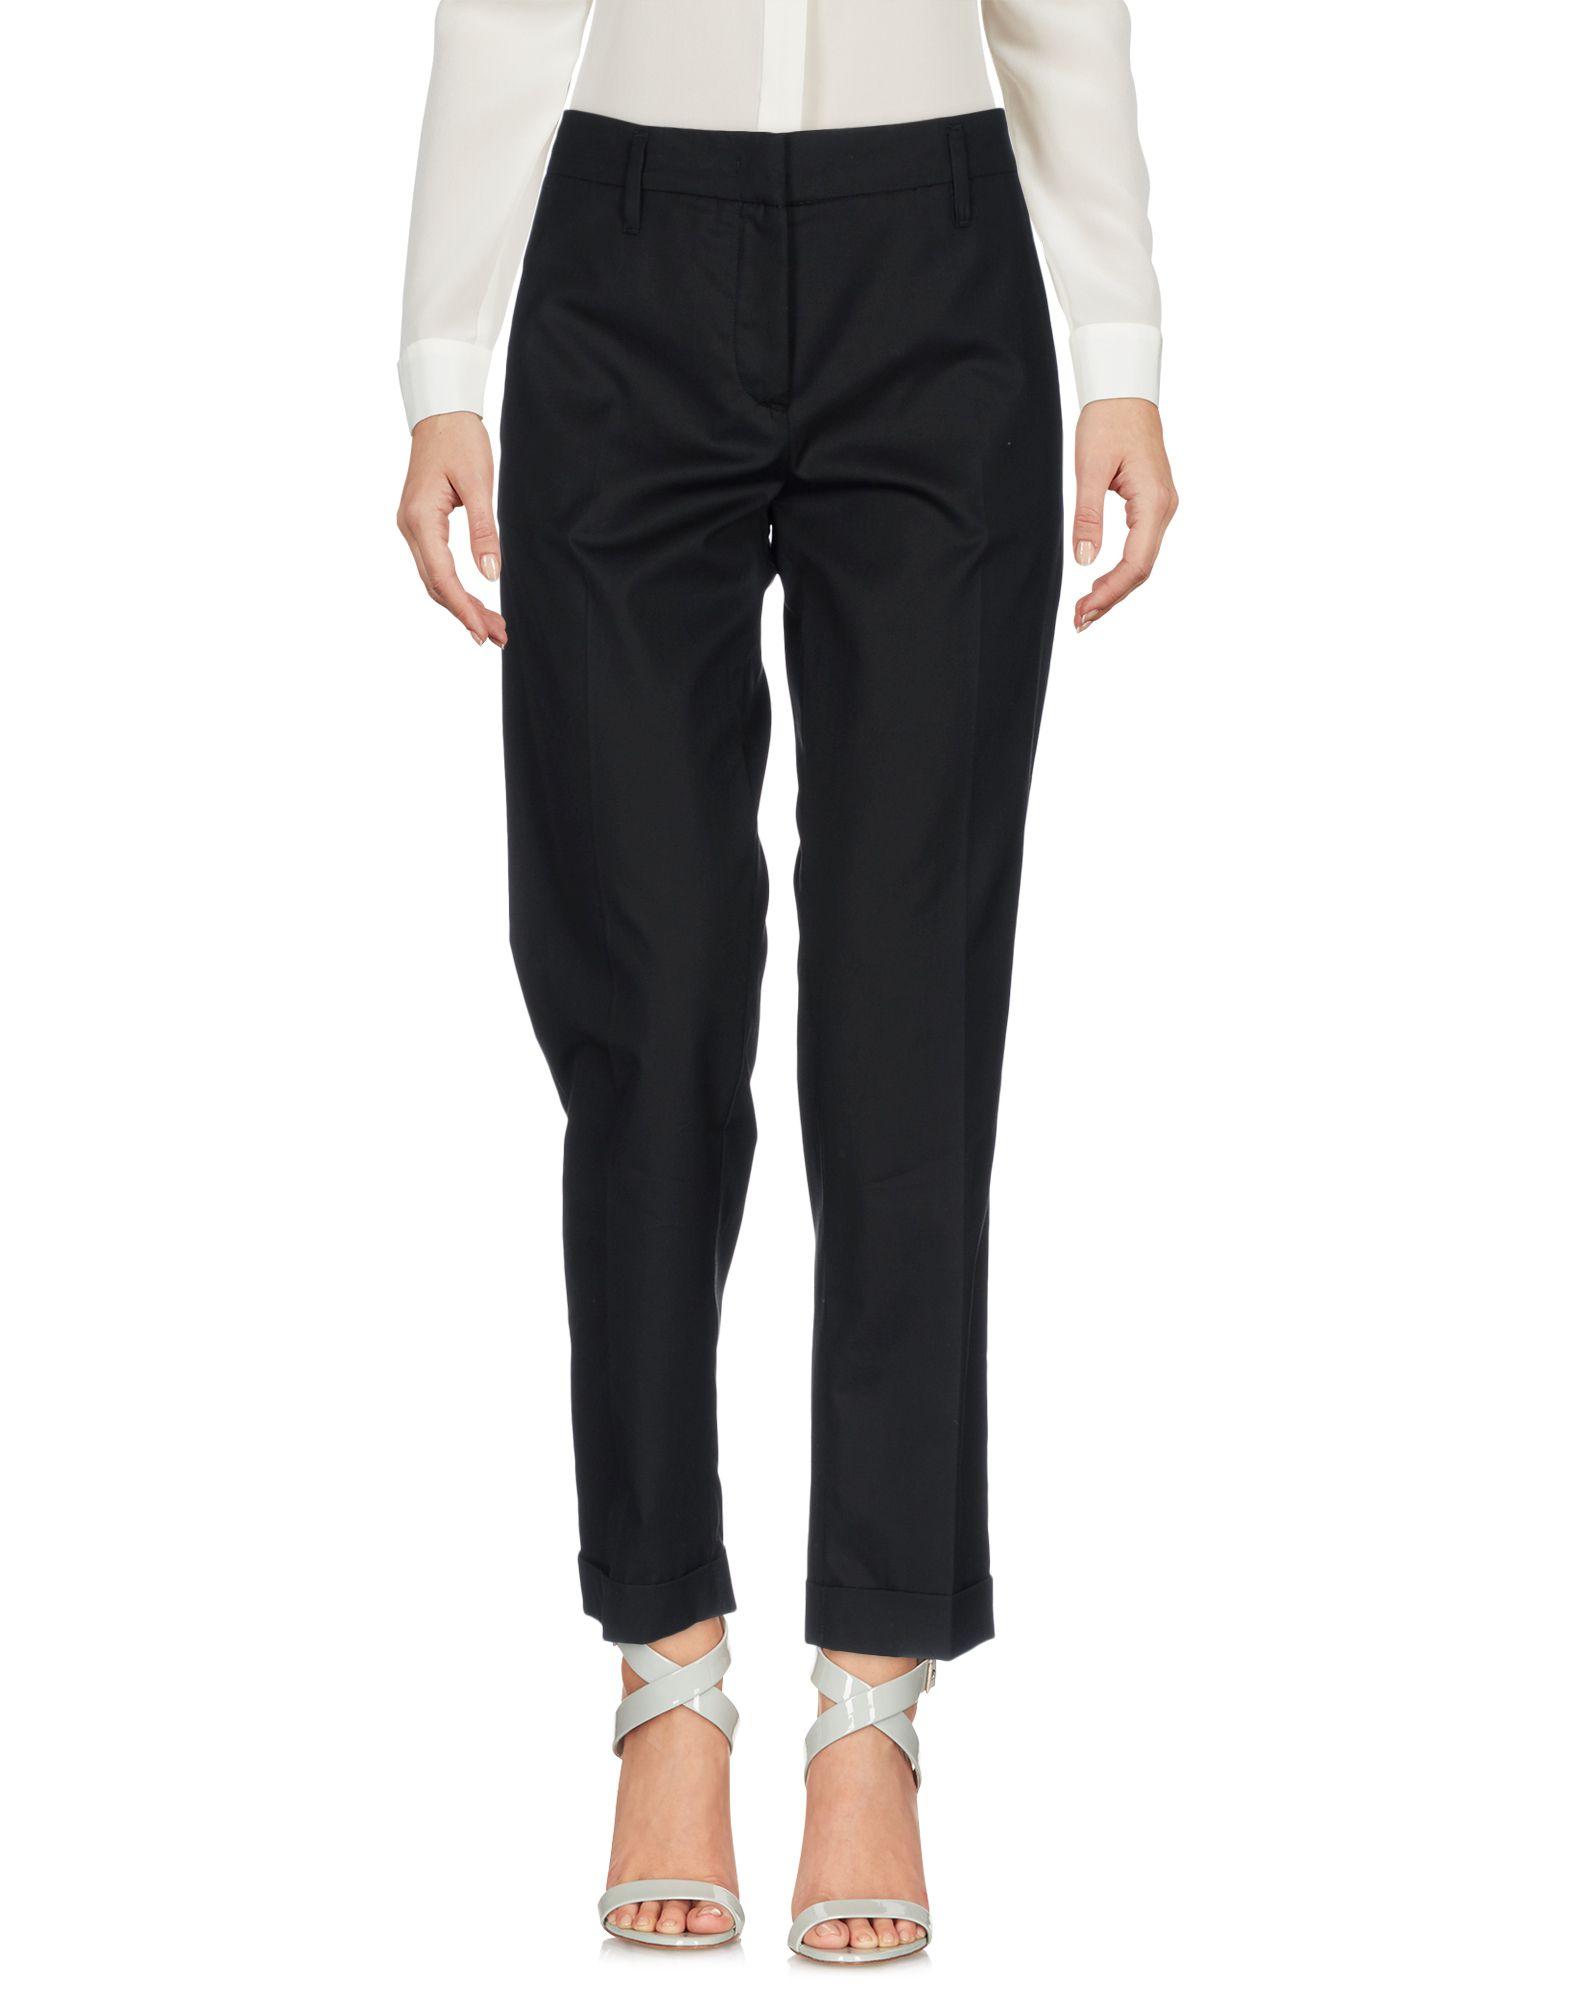 Pantalone Aspesi Donna - Acquista online su ElQjSV6bE